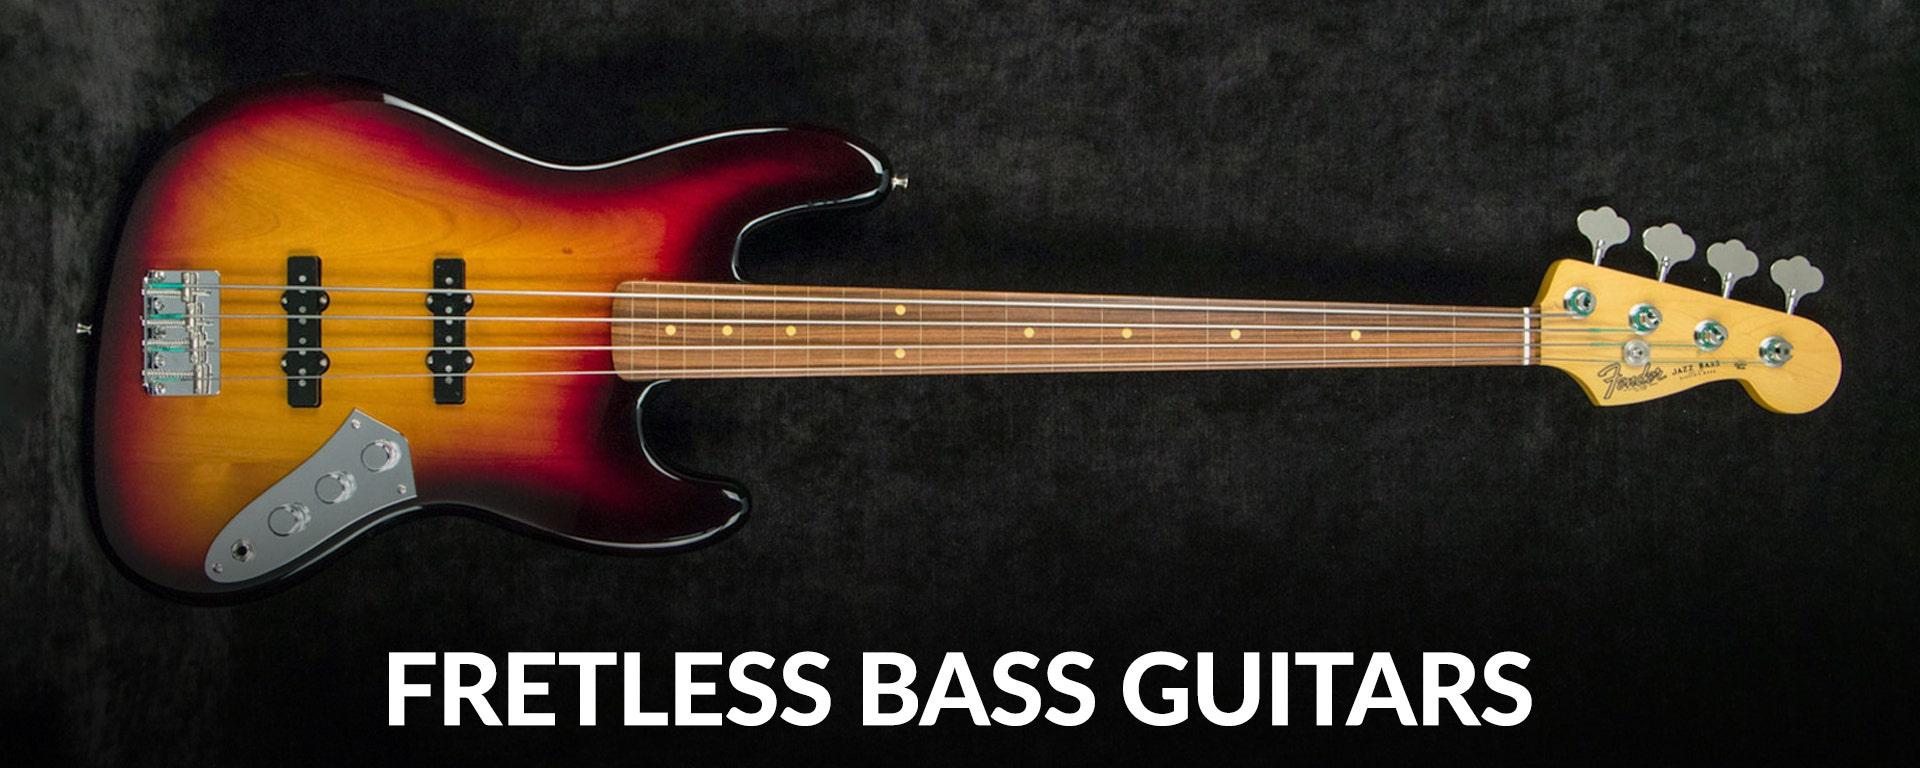 Shop fretless electric bass guitars at Sam Ash